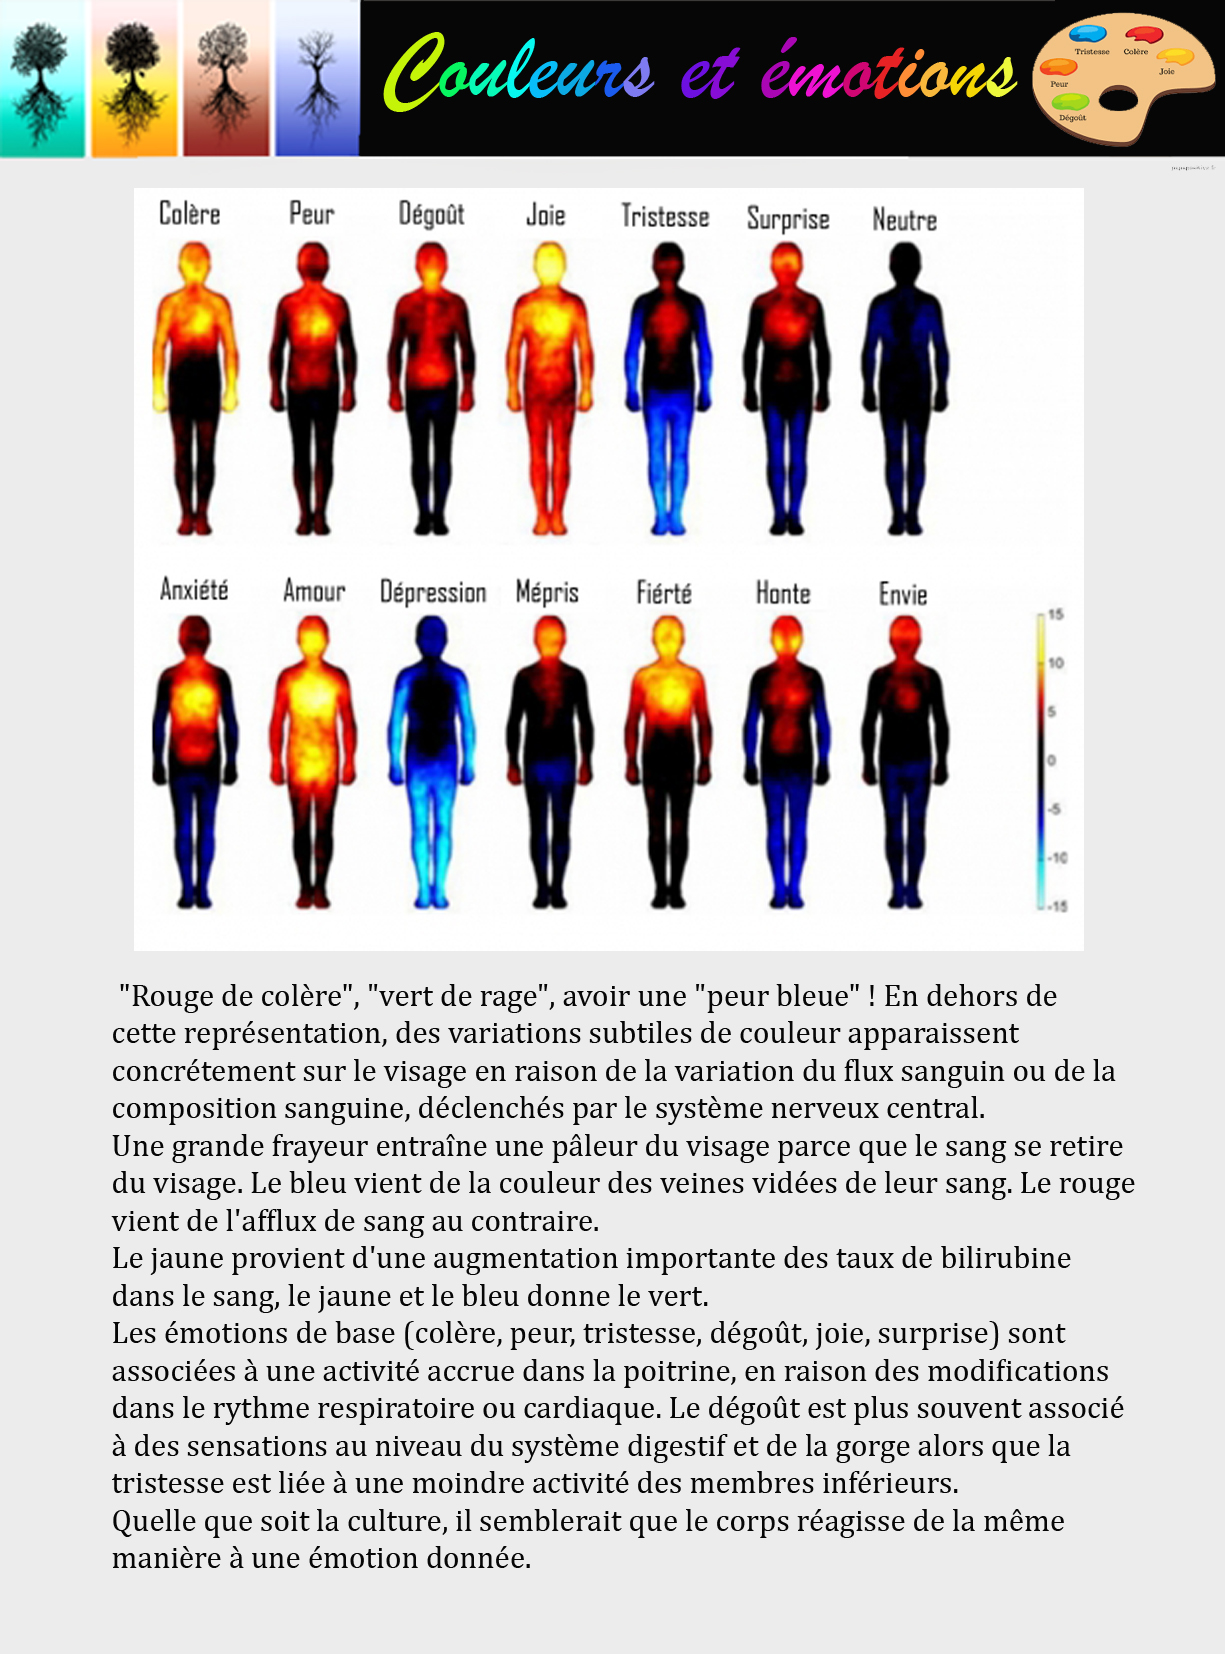 couleurs emotions2.jpg